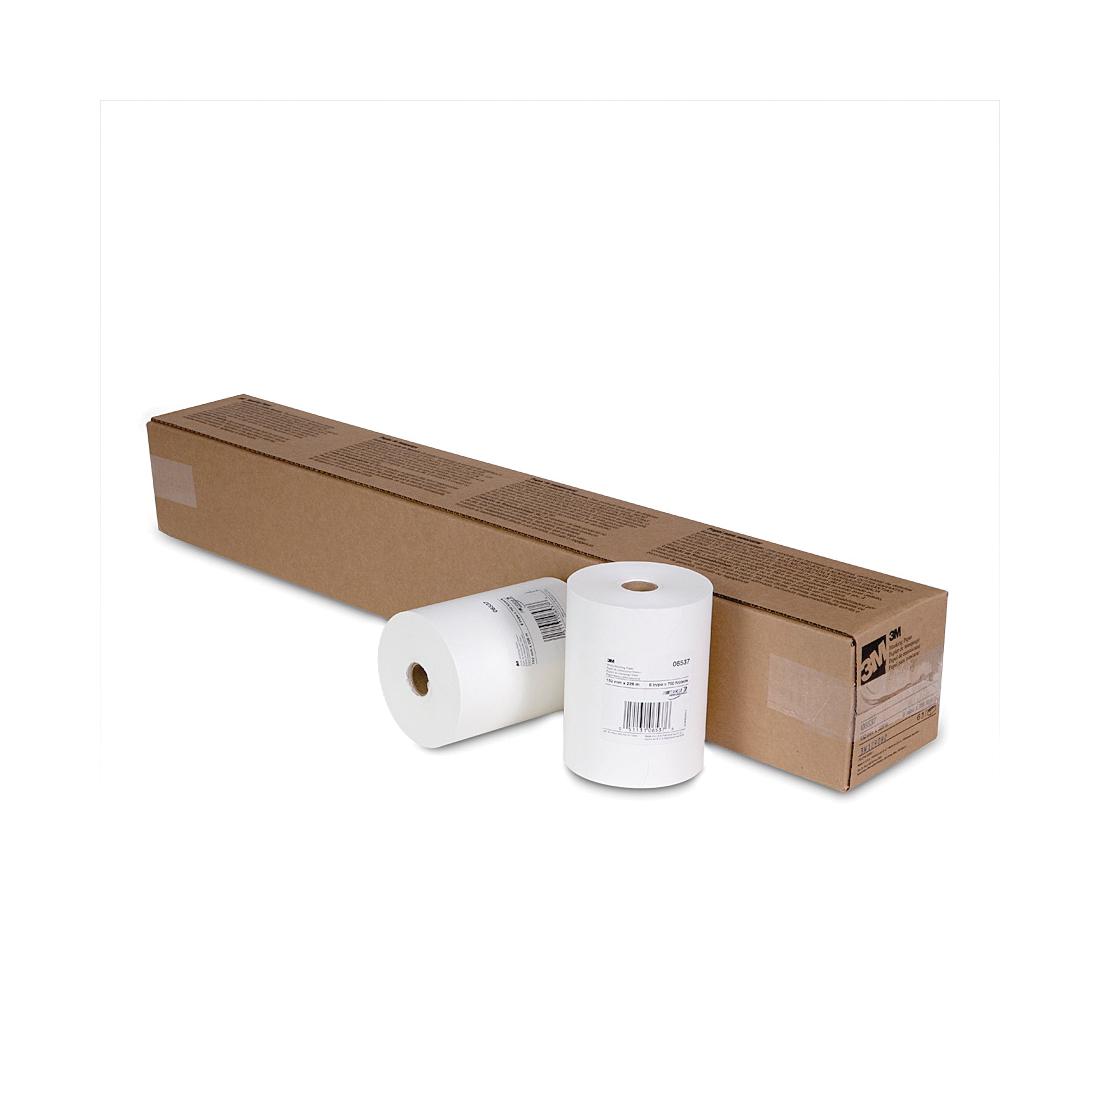 3M™ 051131-06537 Masking Paper, 750 ft Roll L x 6 in W x 1.5 mil THK, Paper, White